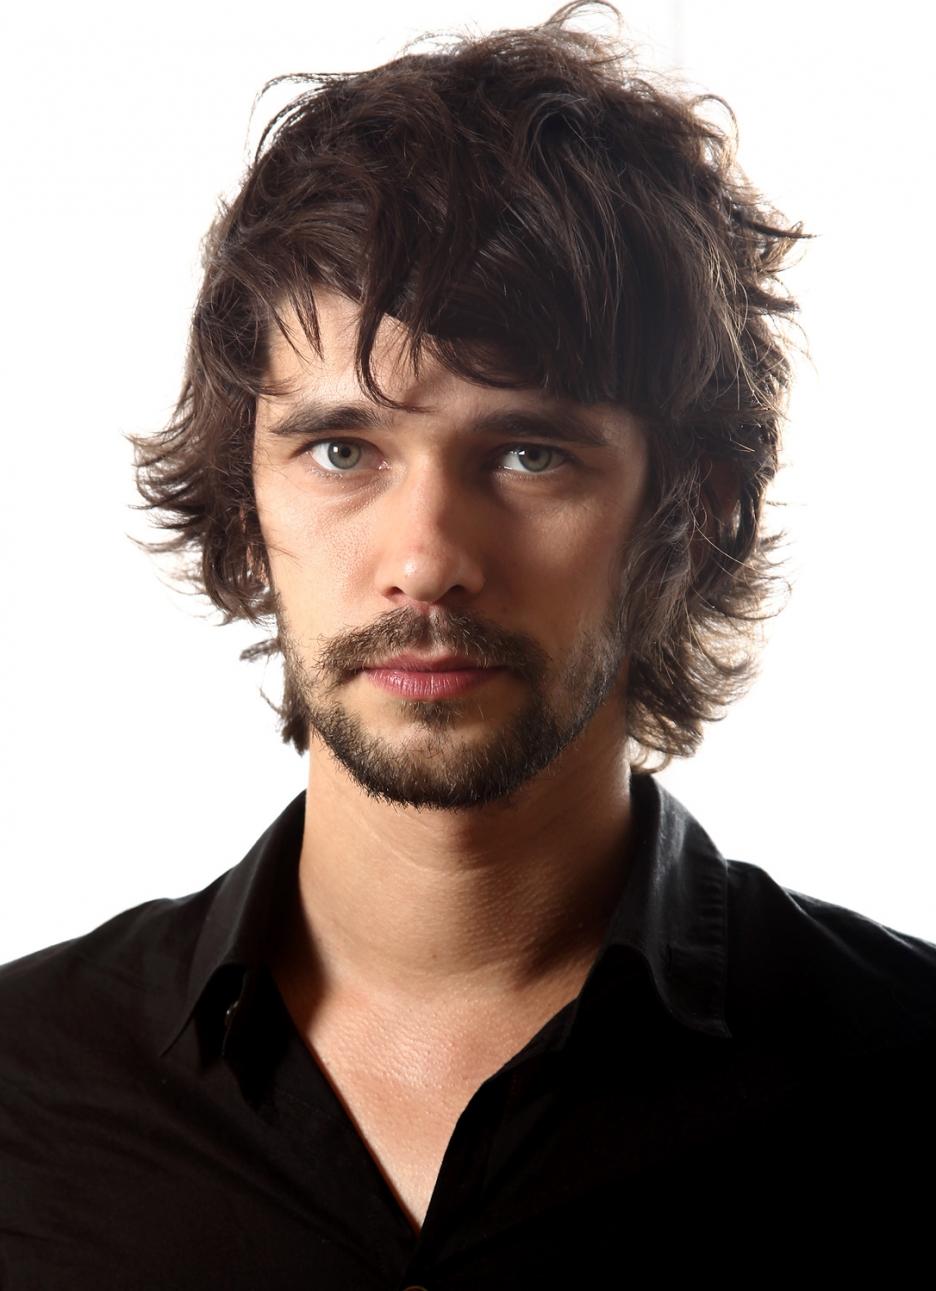 Ben Whishaw (born 1980)